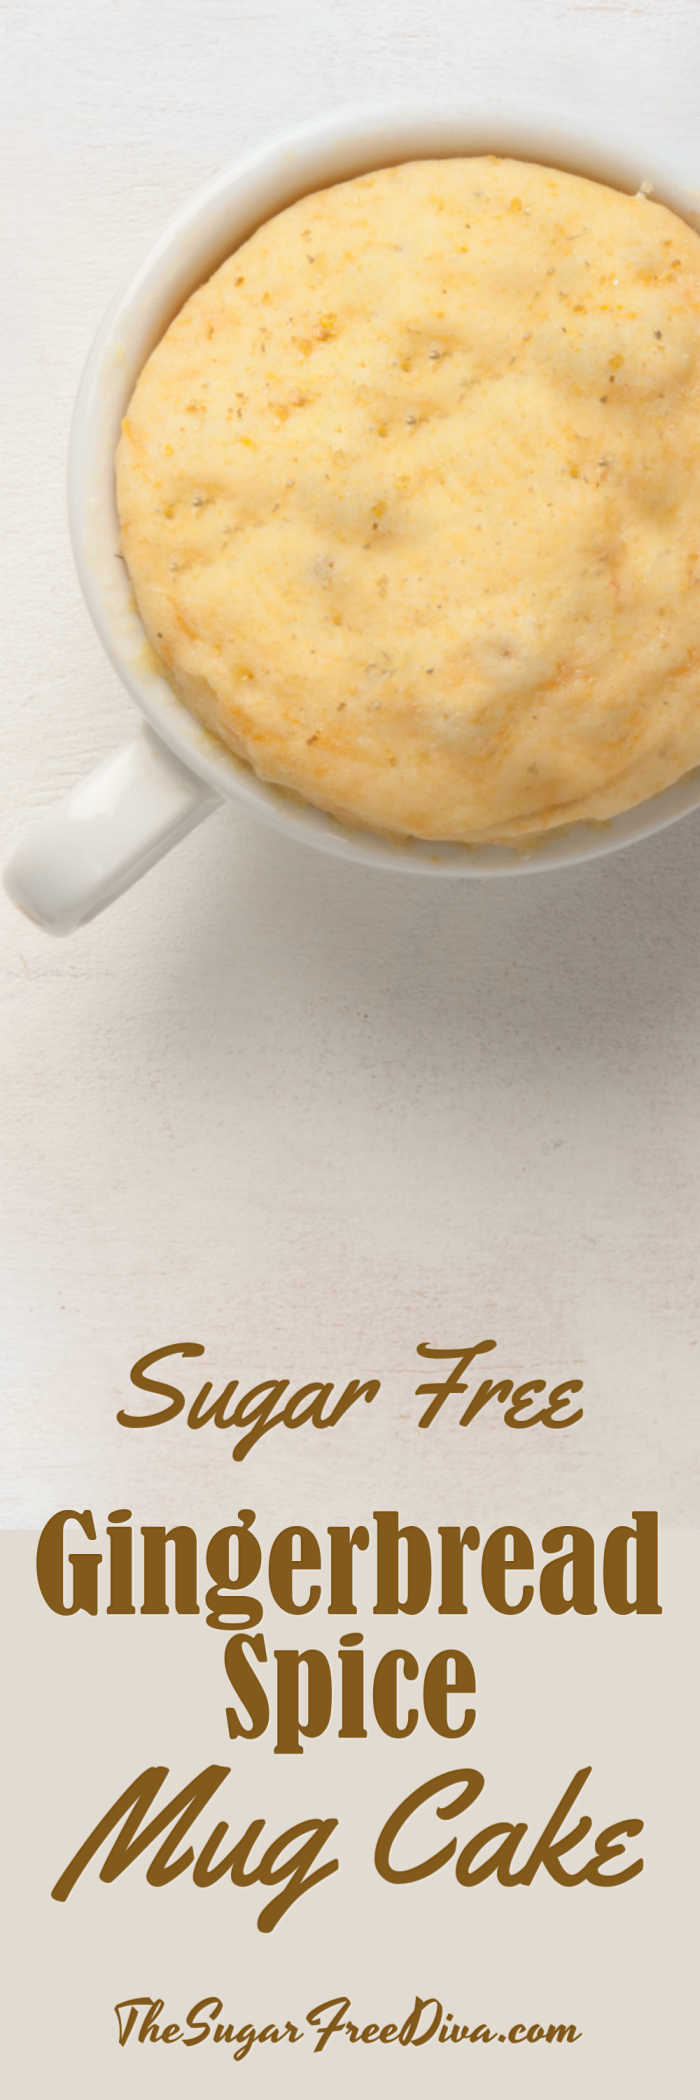 Gingerbread Spice Keto Low Carb Mug Cake